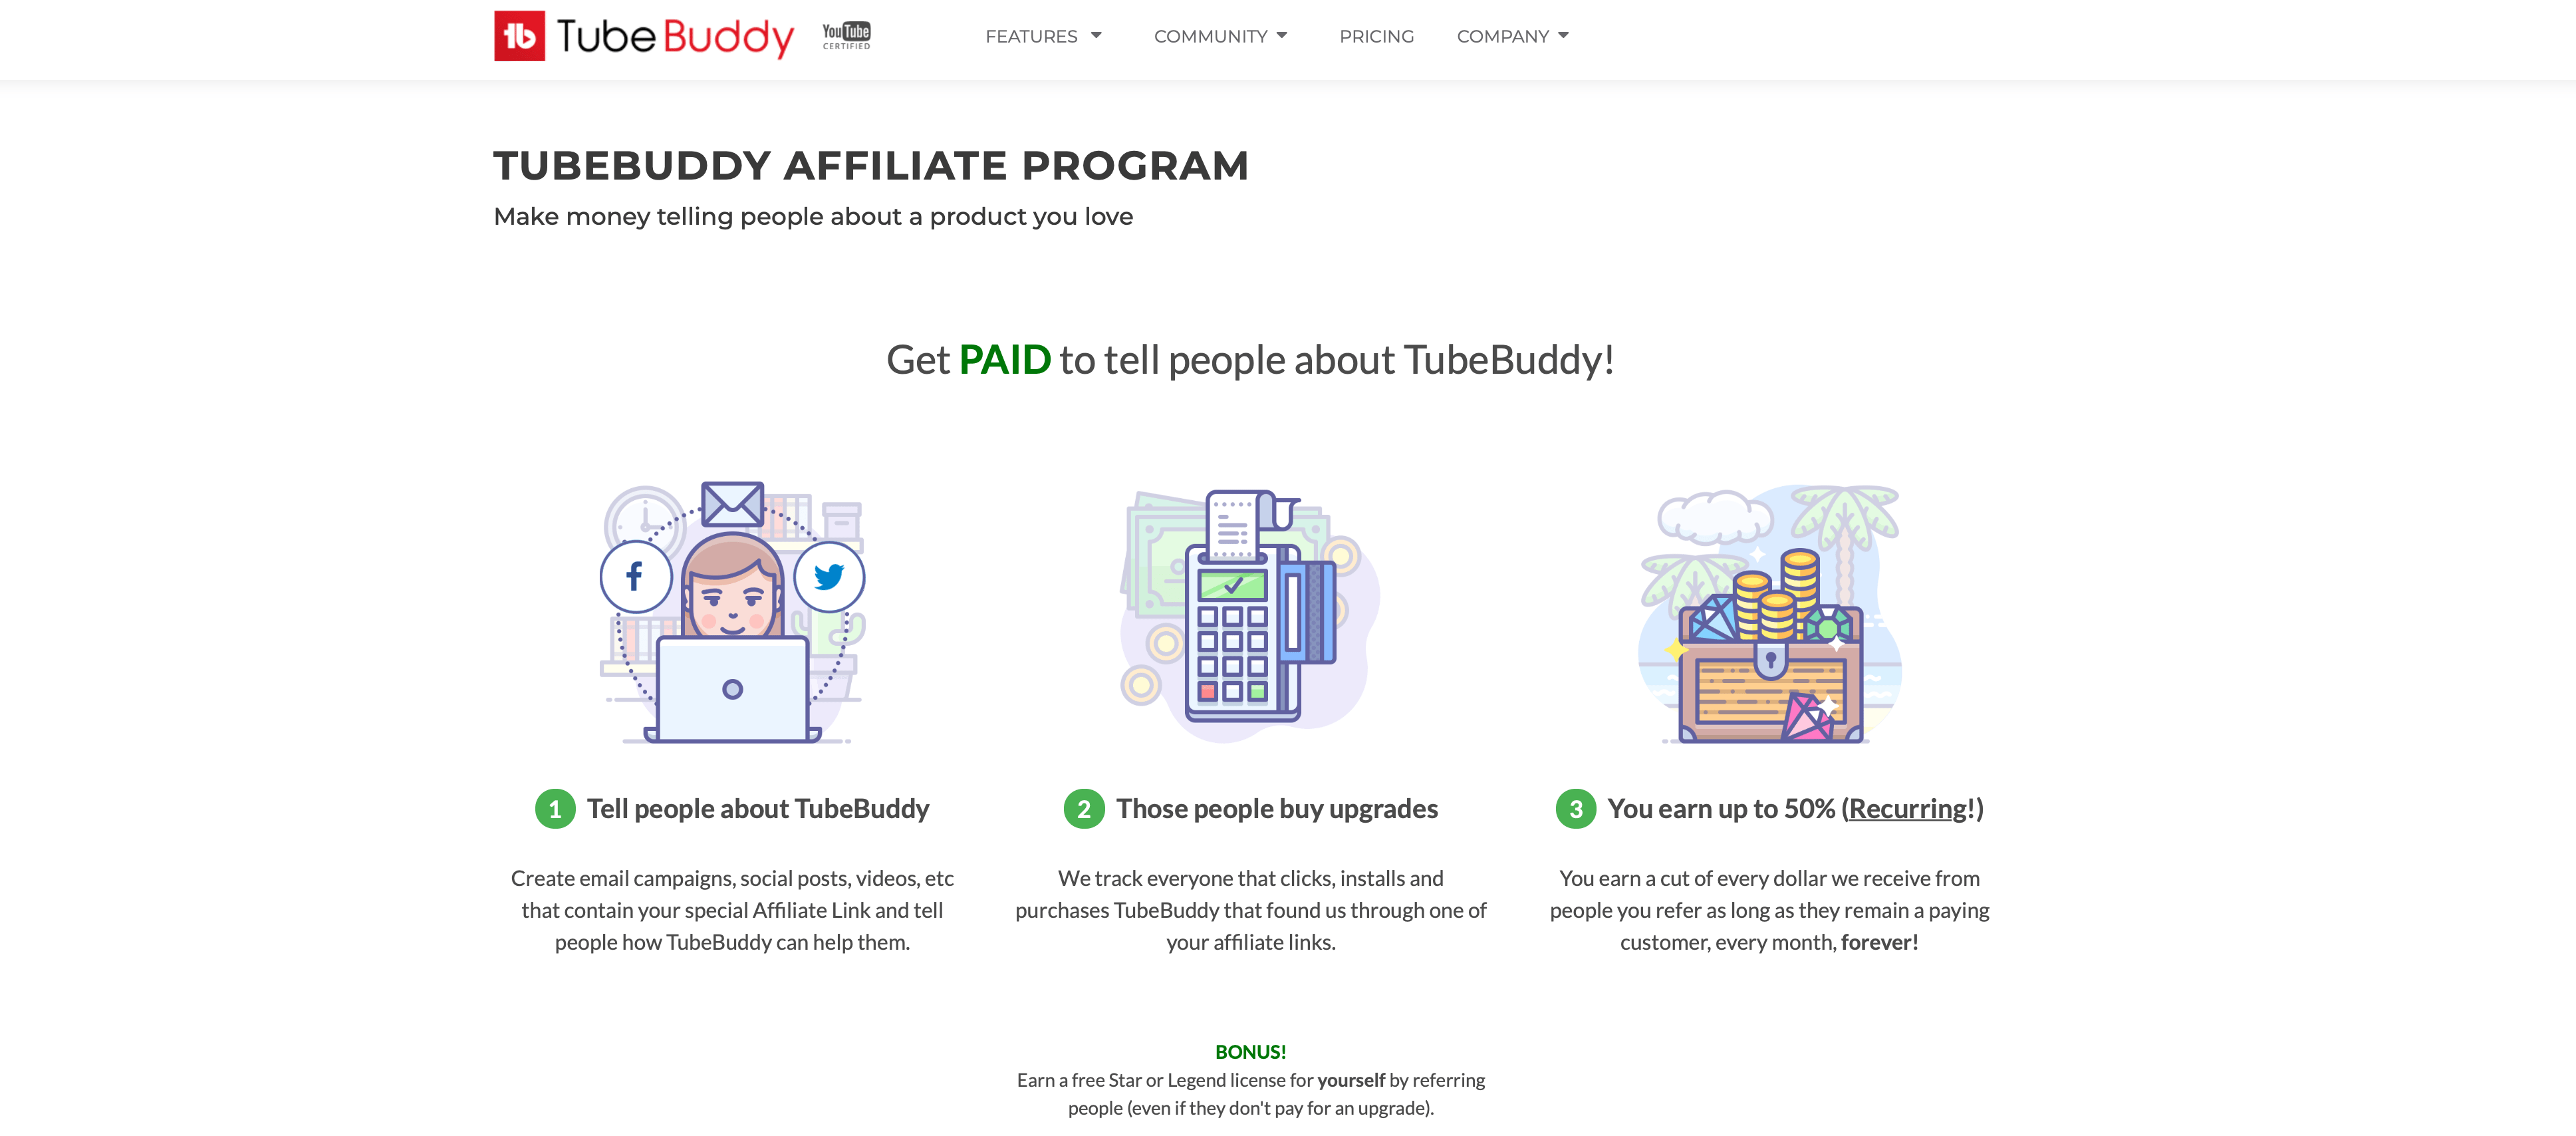 tubebuddy-affiliate-program-Youtube-SaaS-affiliate